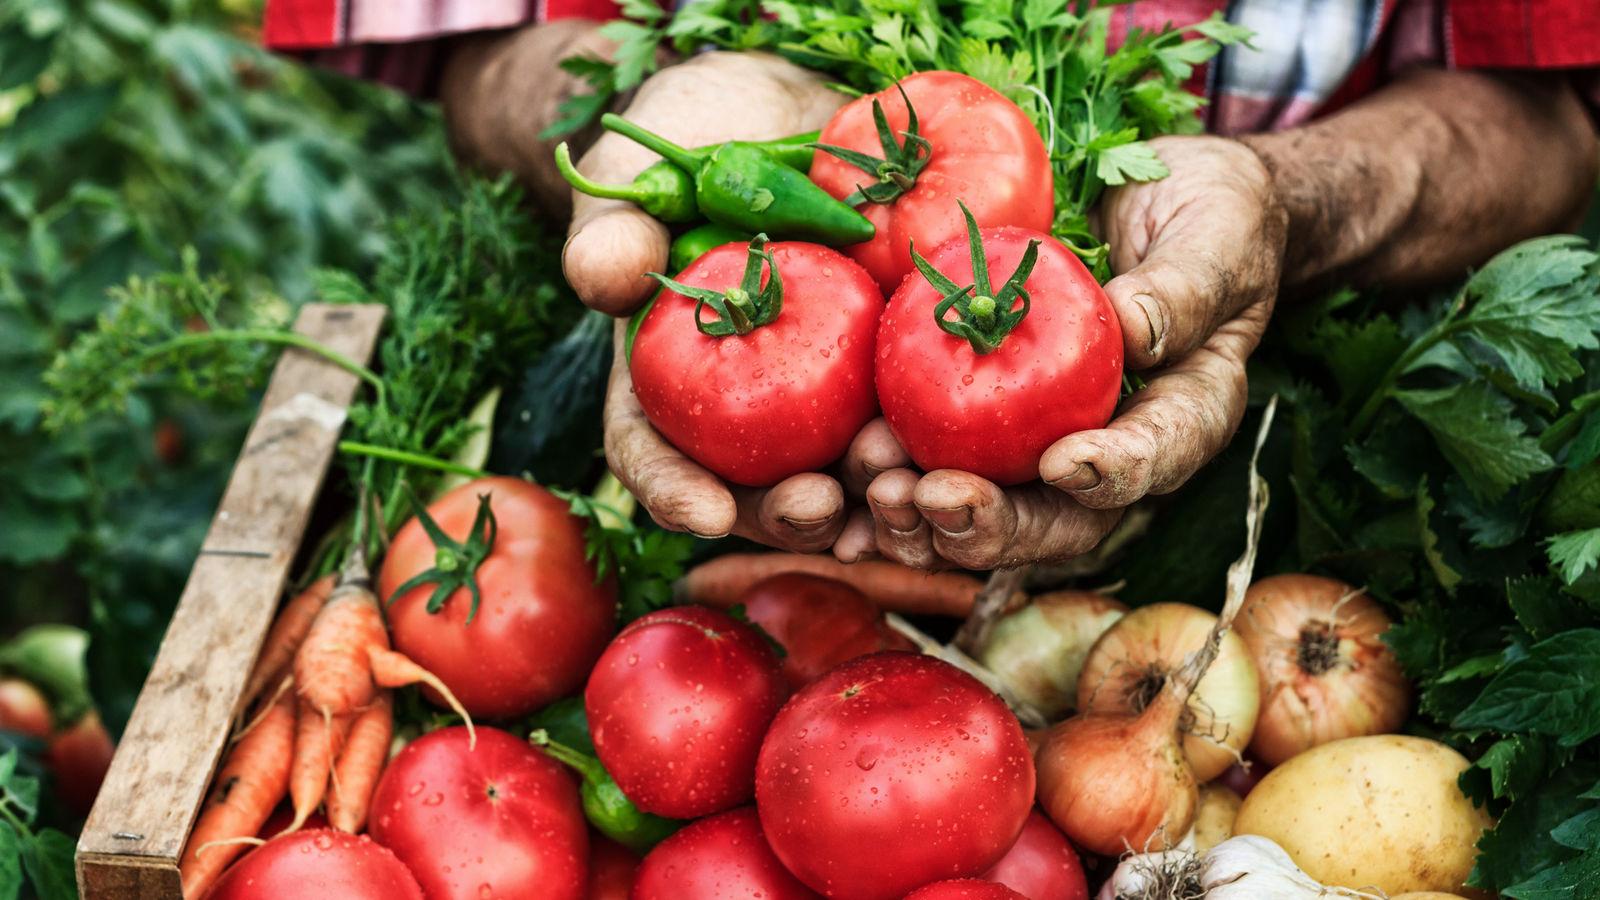 A man holding a basket of fresh produce